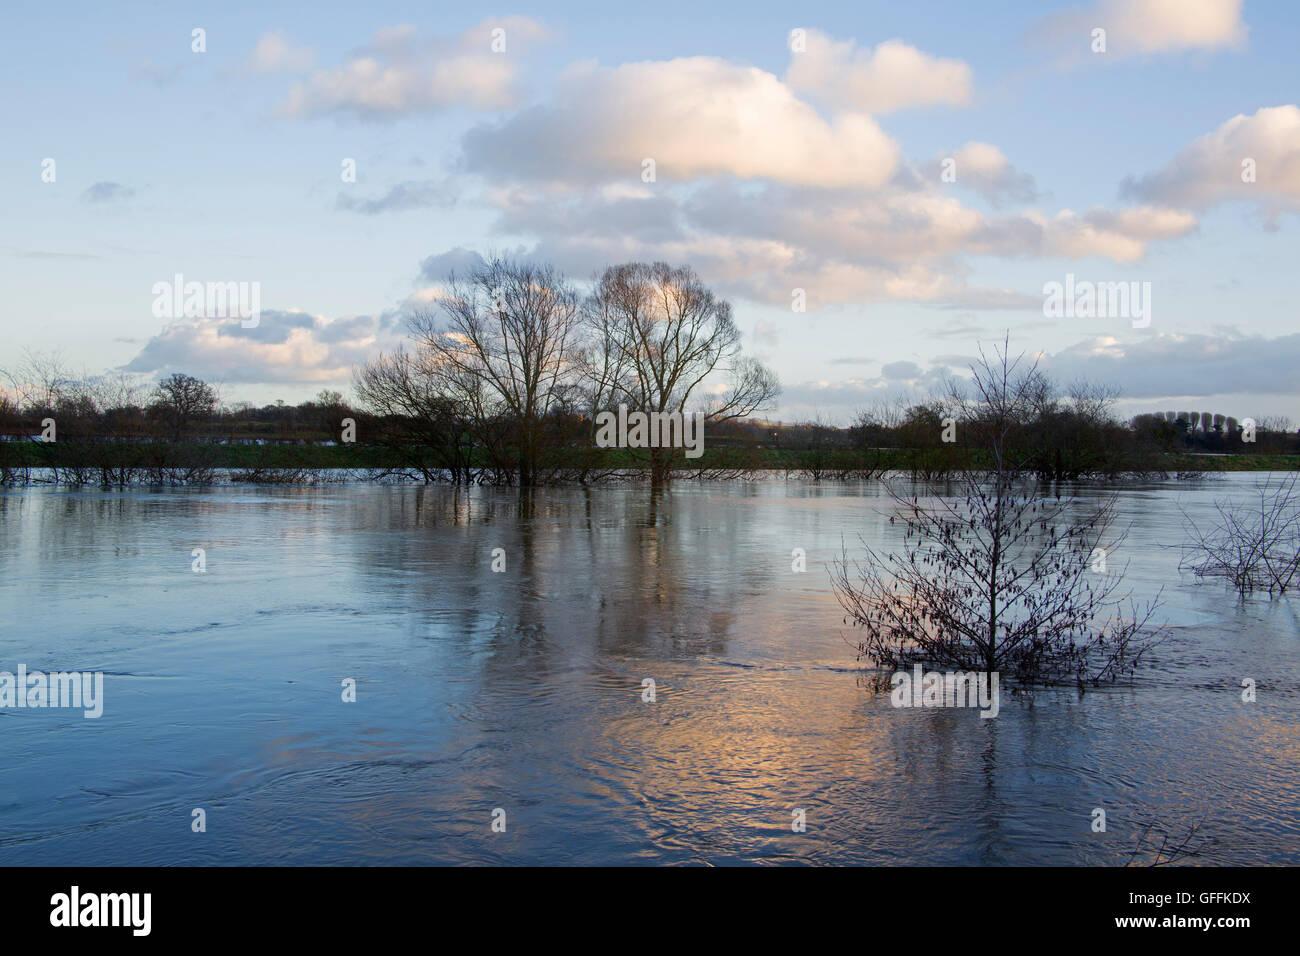 River Severn overflowing onto flood plain. Worcestershire, UK - Stock Image